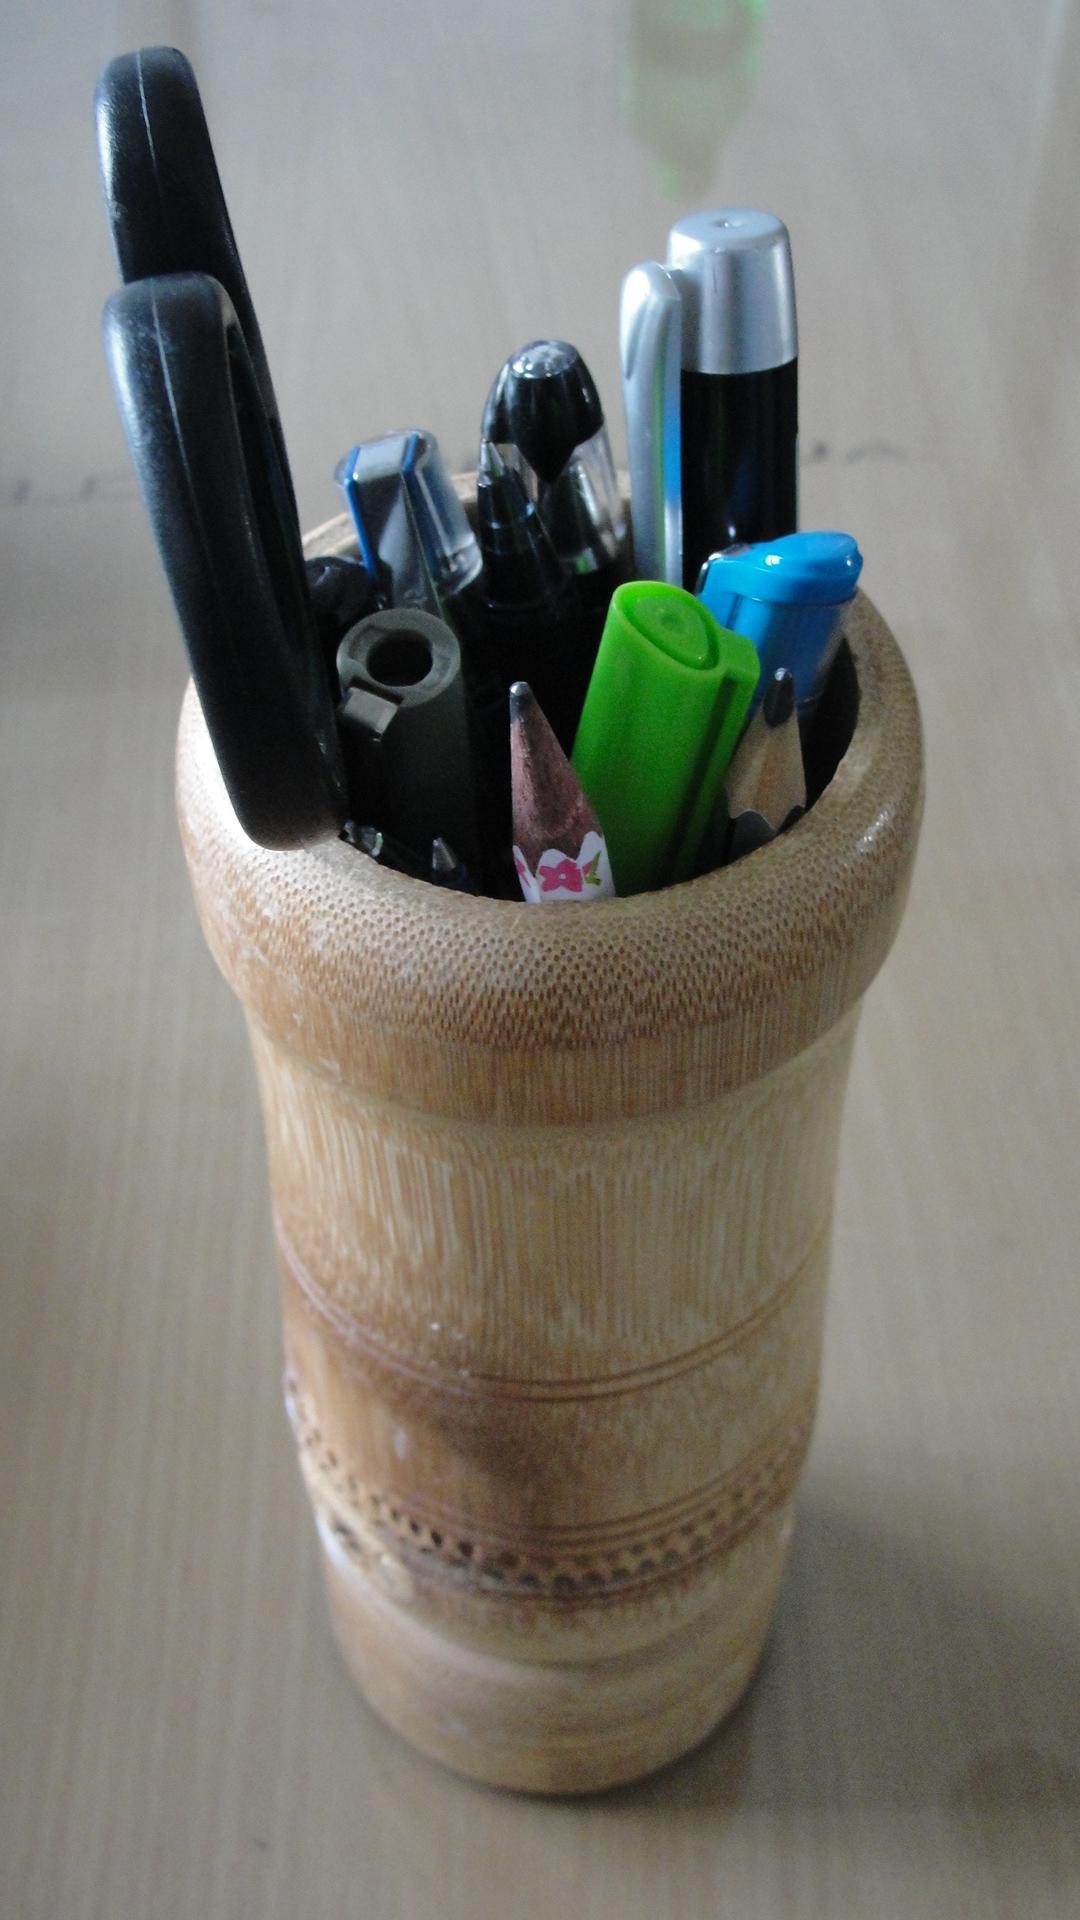 File:Bamboo art work (pen stand).jpg